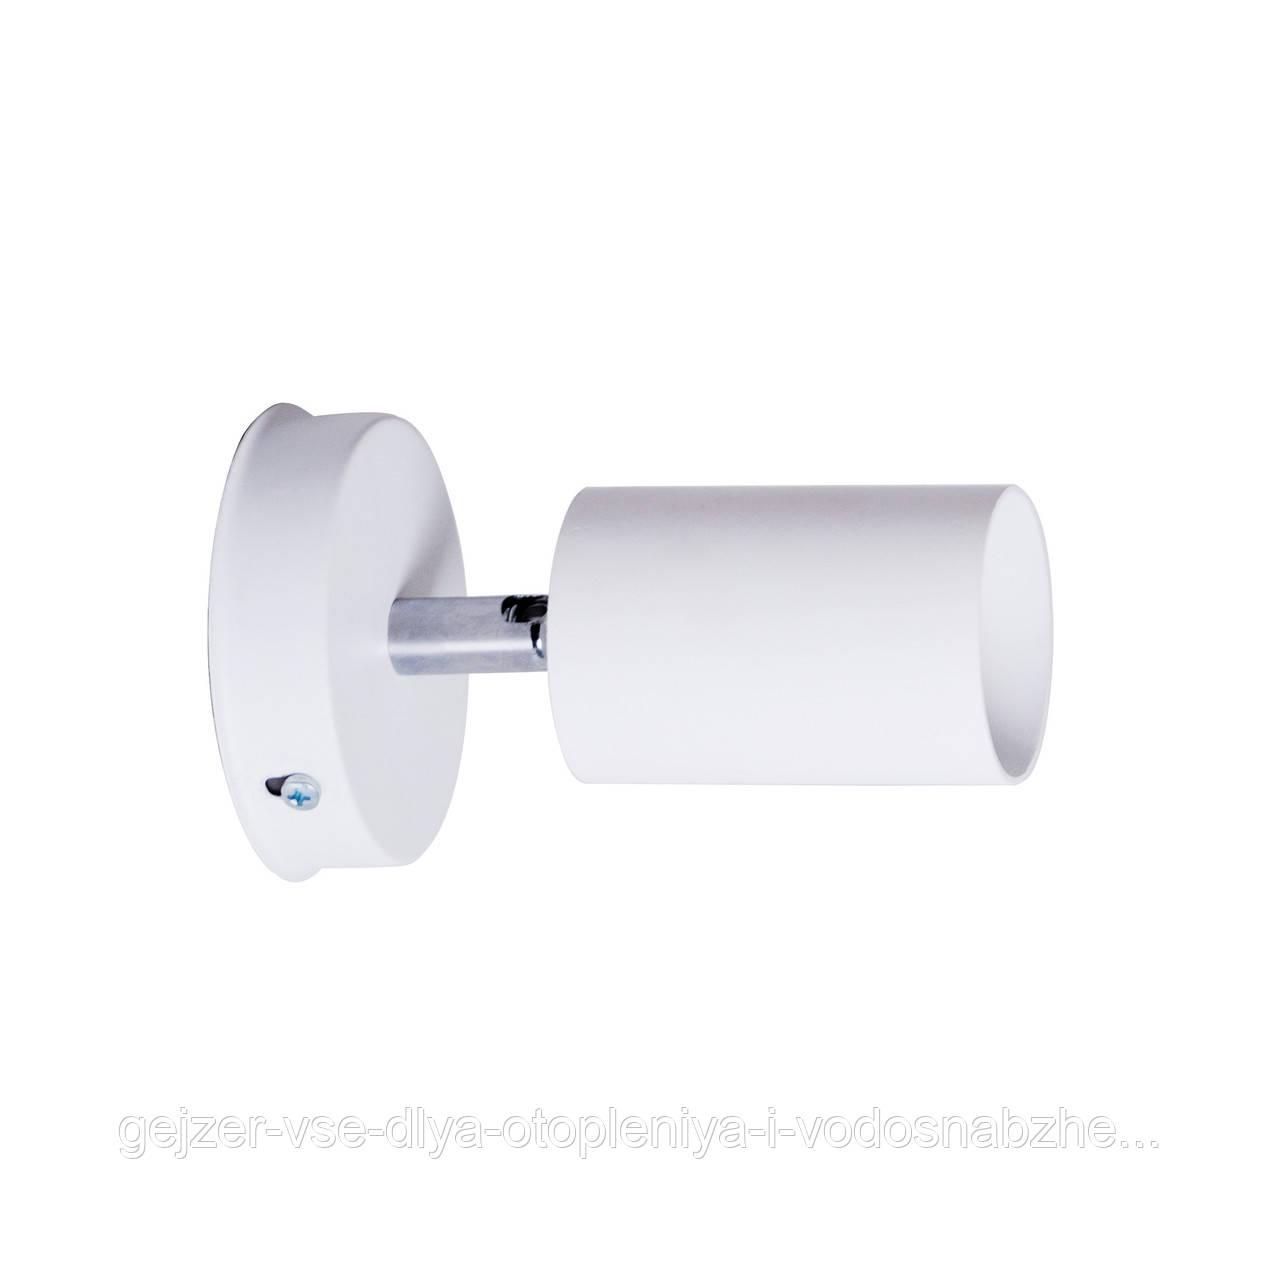 Бра Atma Light серии Chime GU10 W90 White